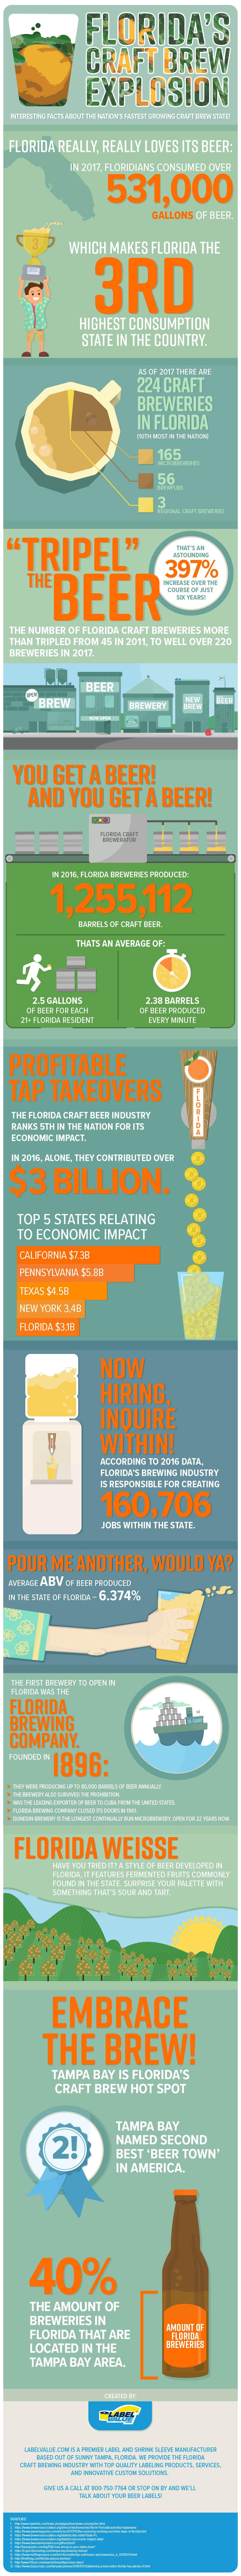 Florida's Craft Brew Explosion